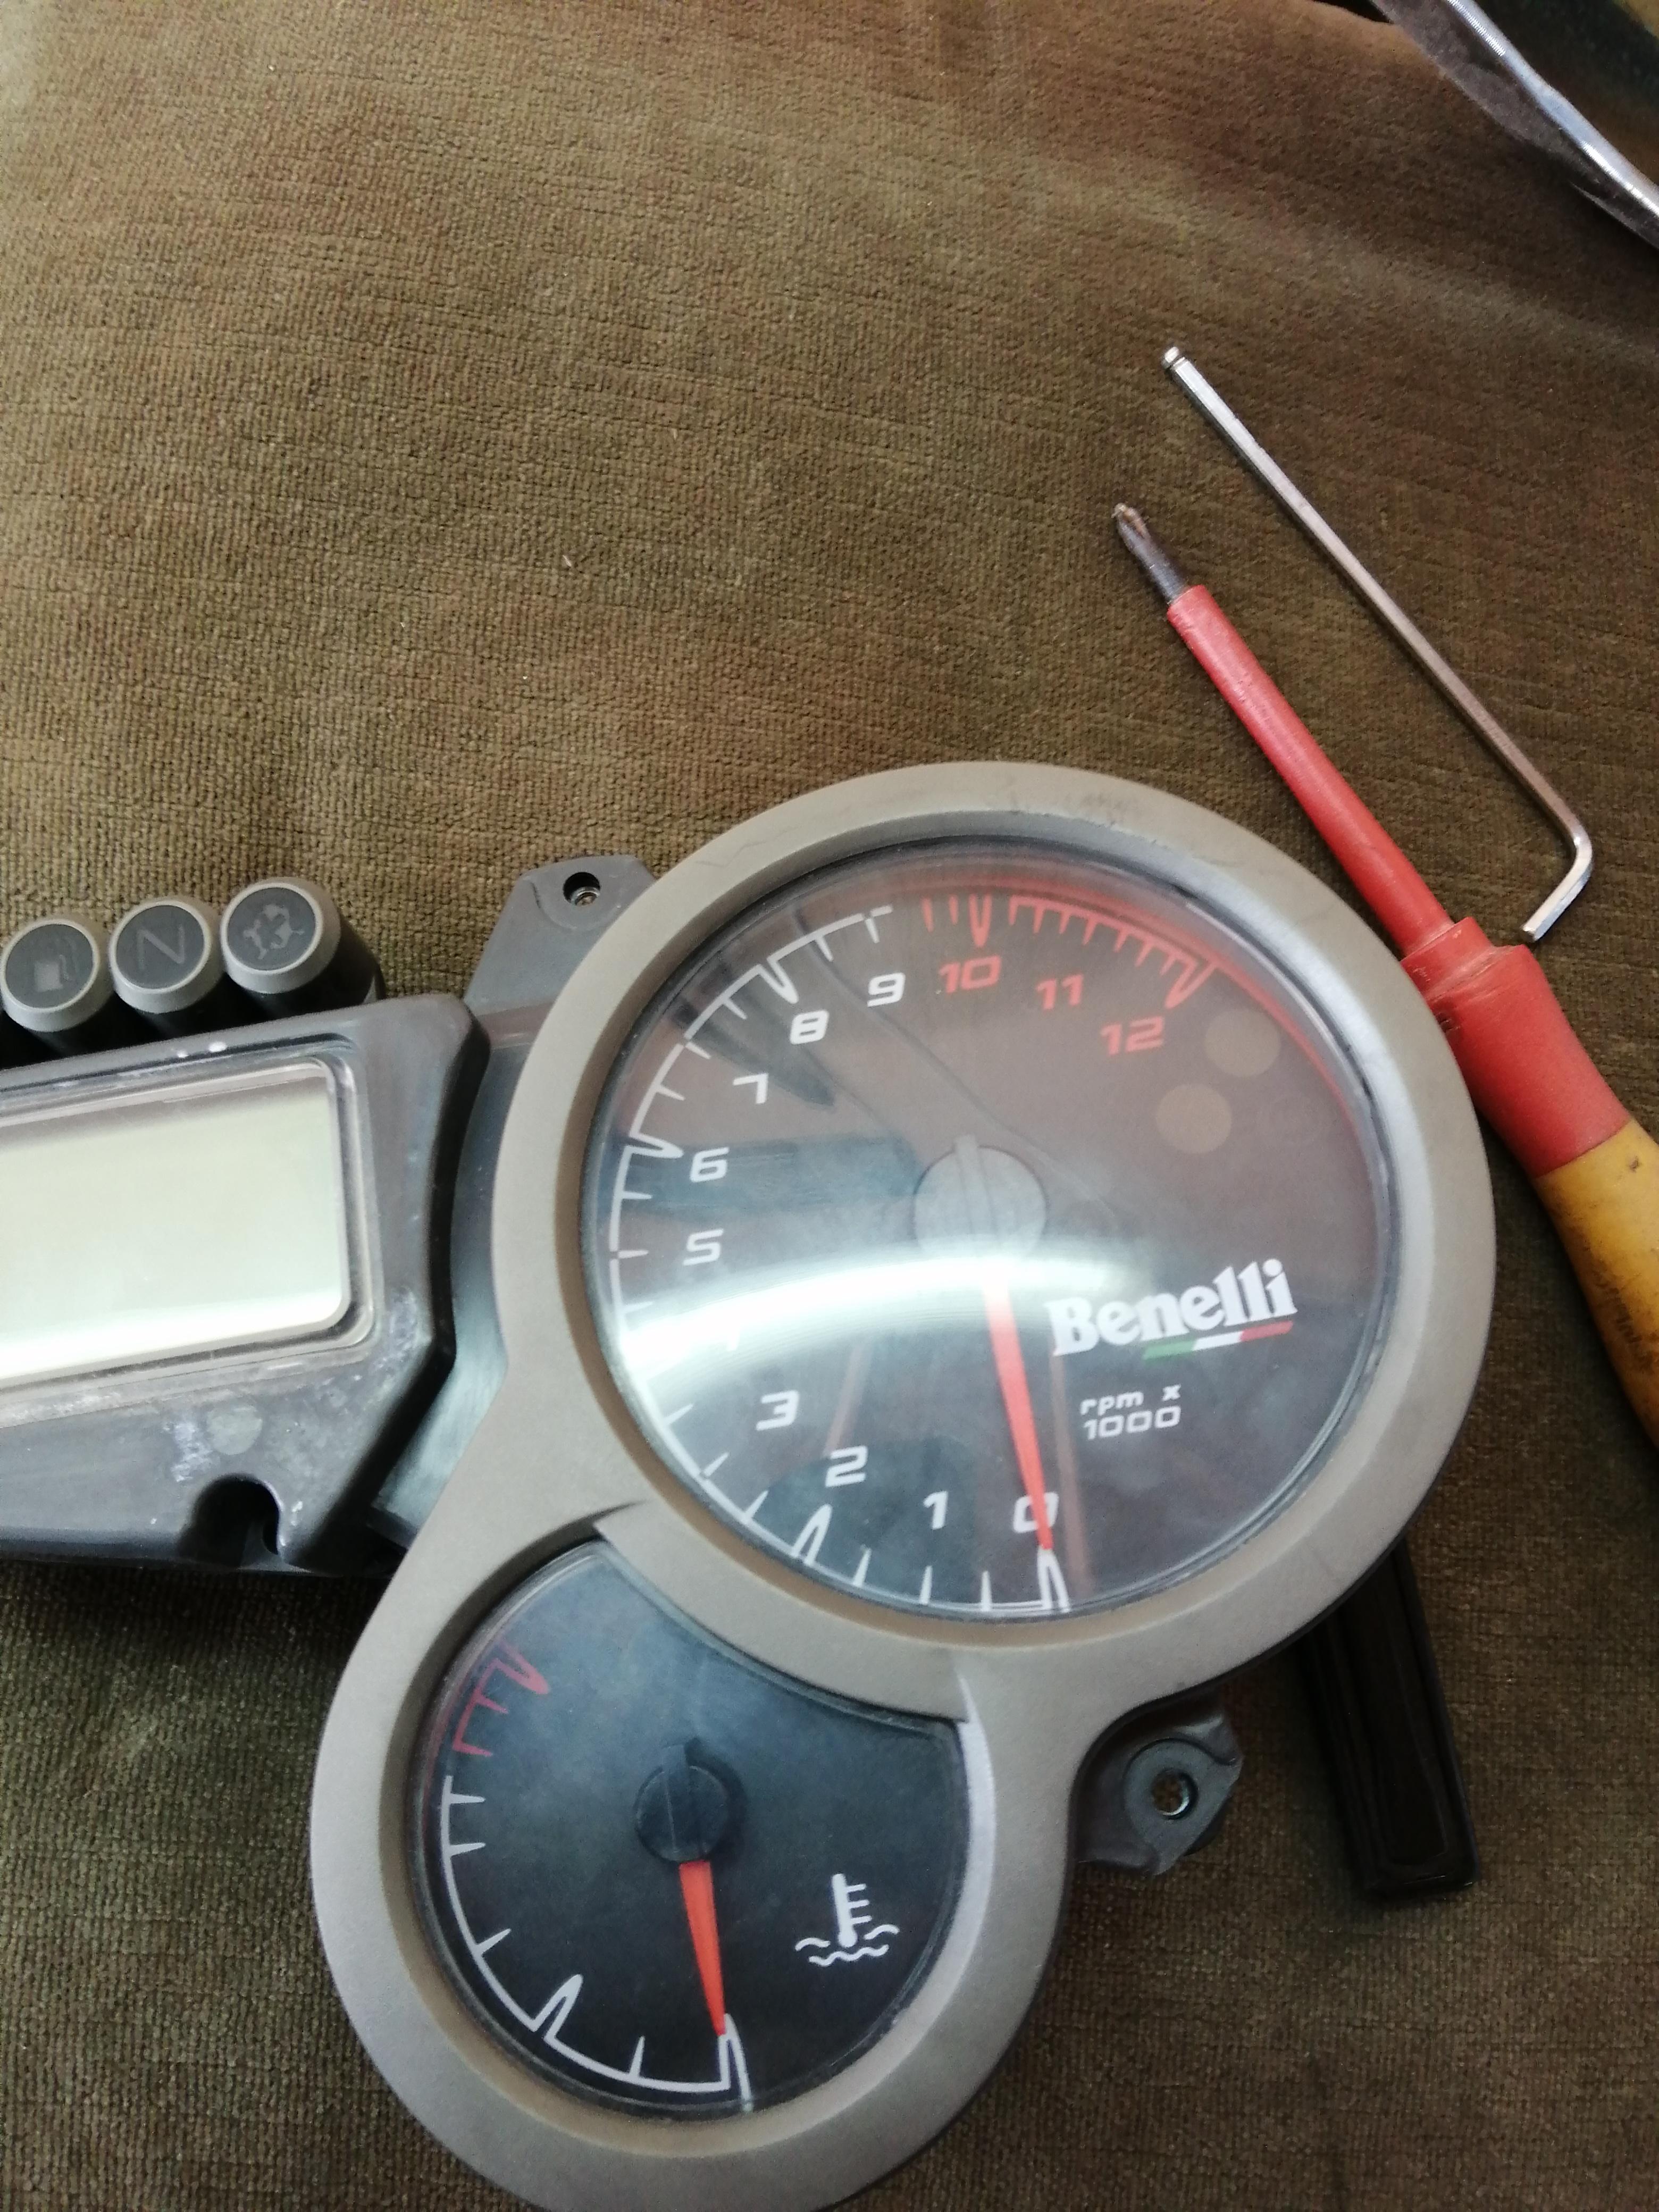 Needle RPM gauge stays at 4000rpm-img_20200203_100232_1580766429918.jpg